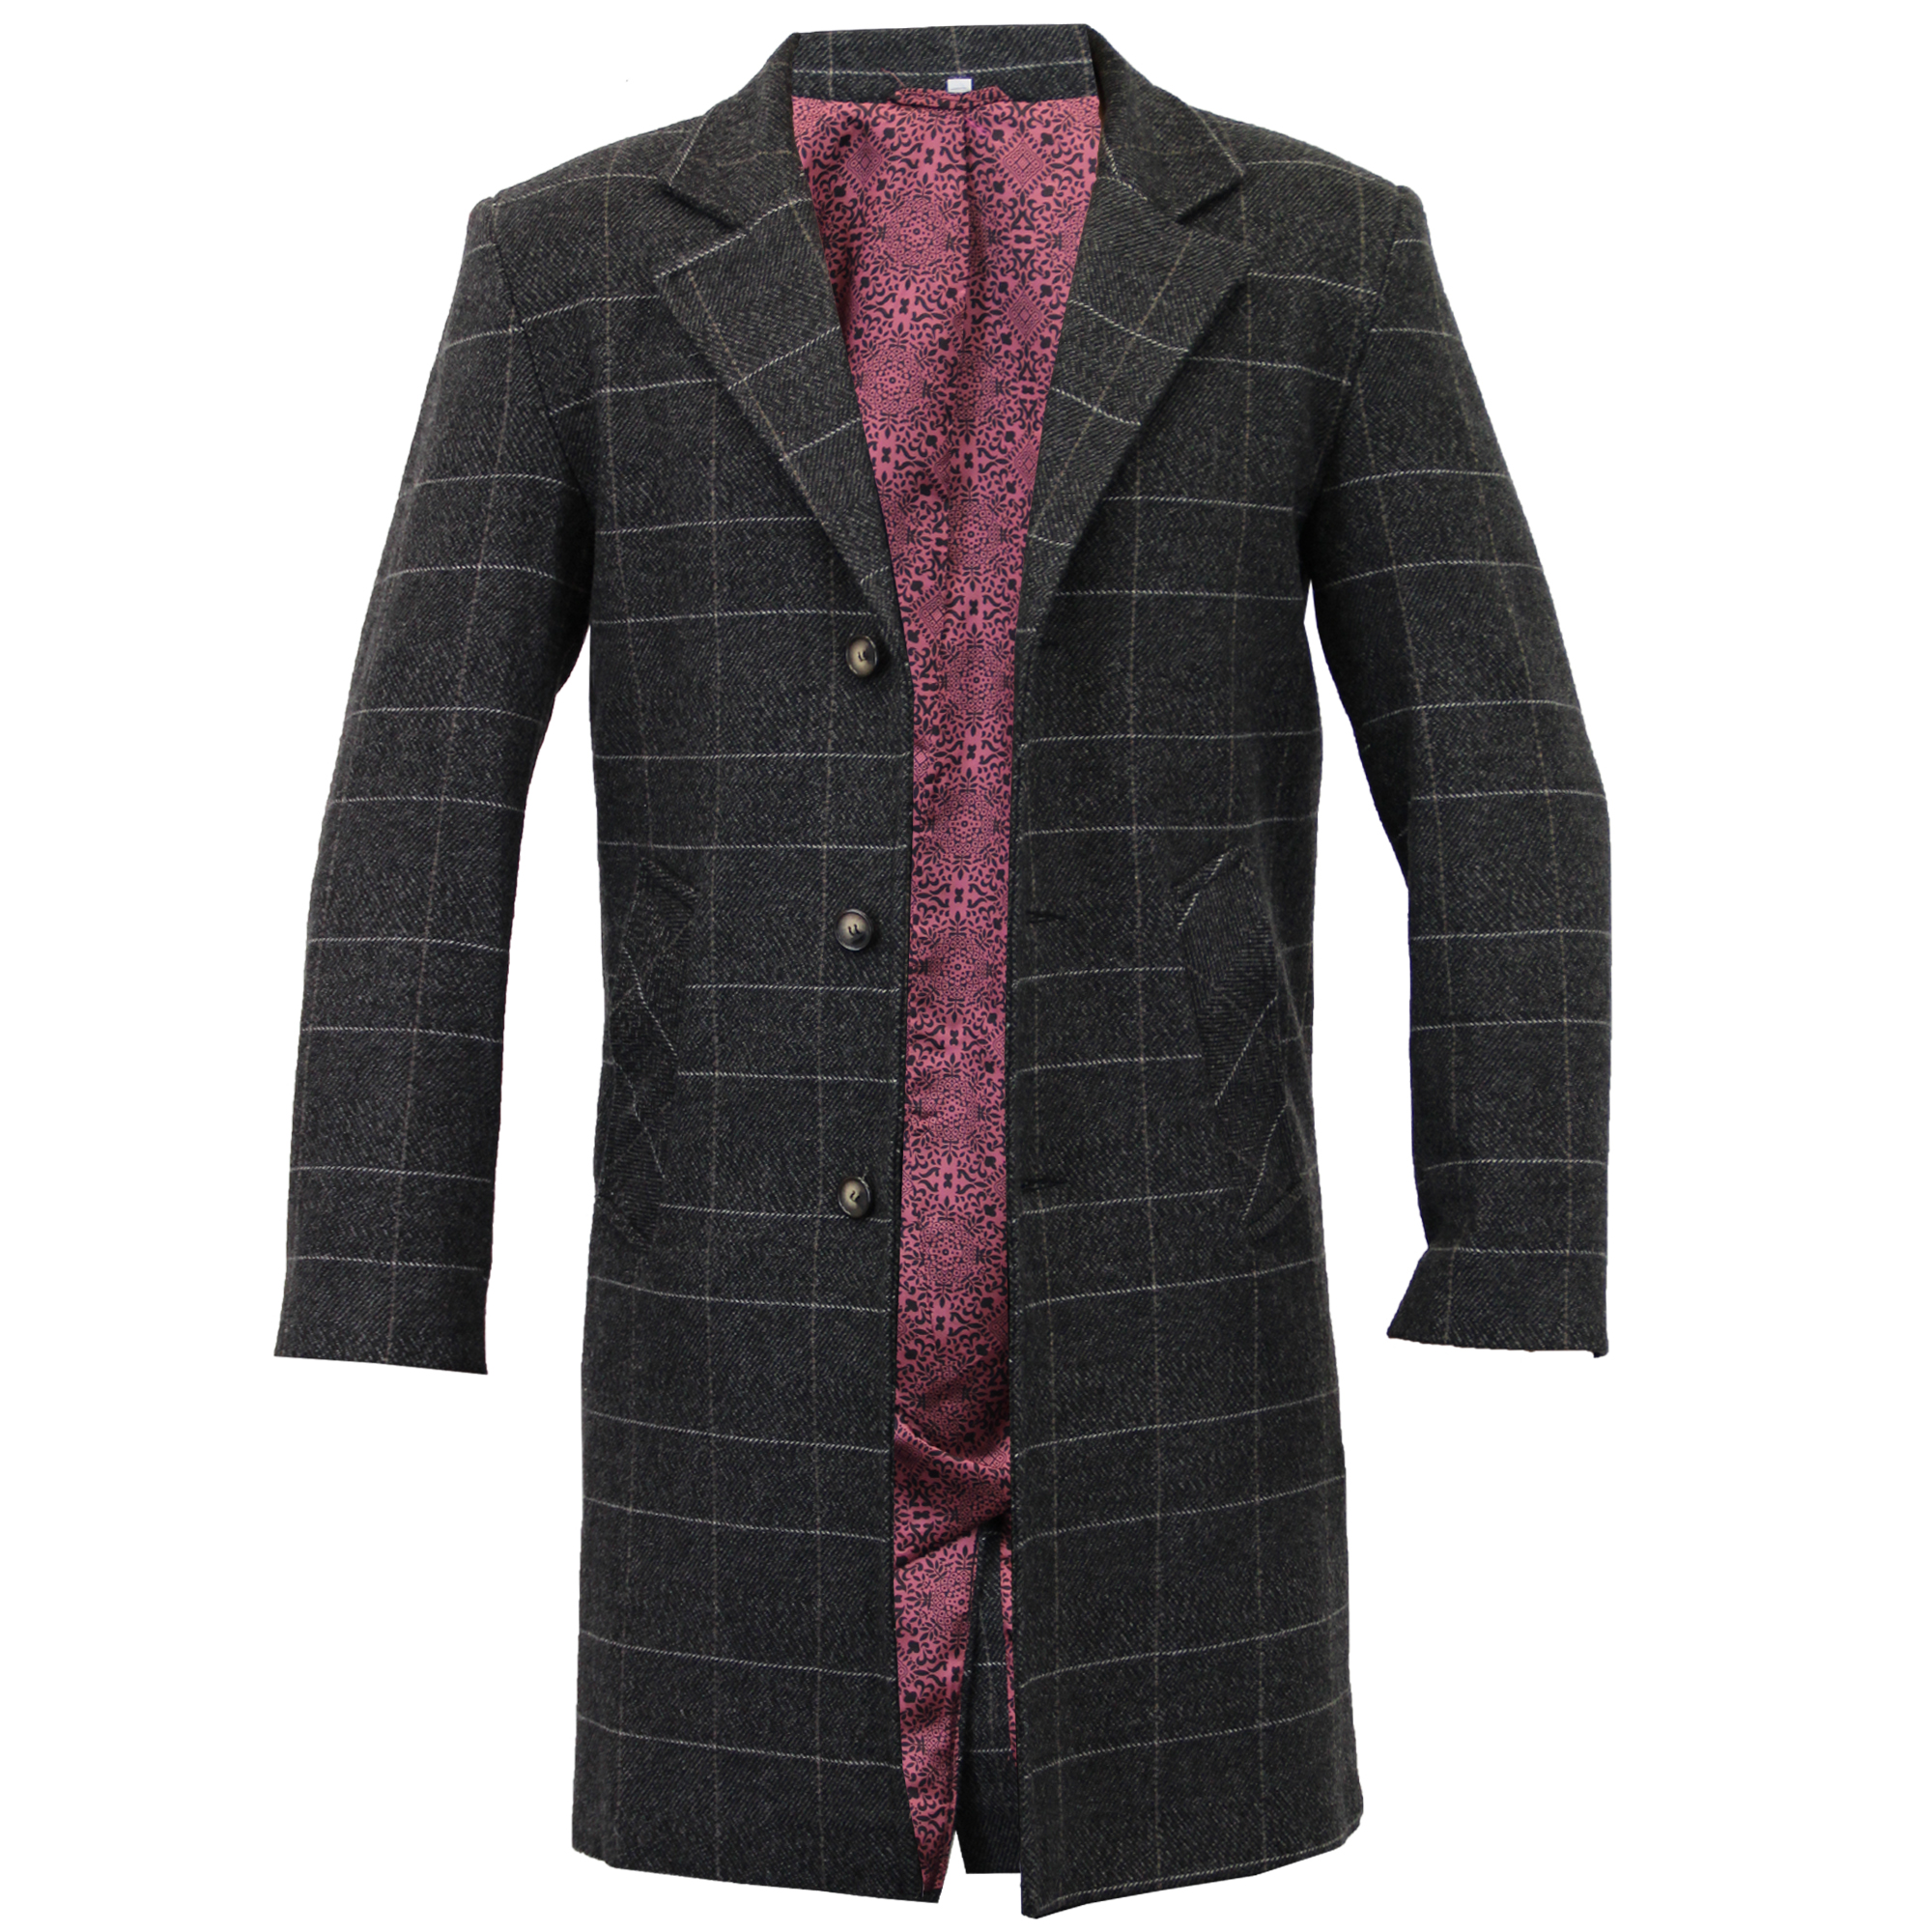 Long wool overcoat